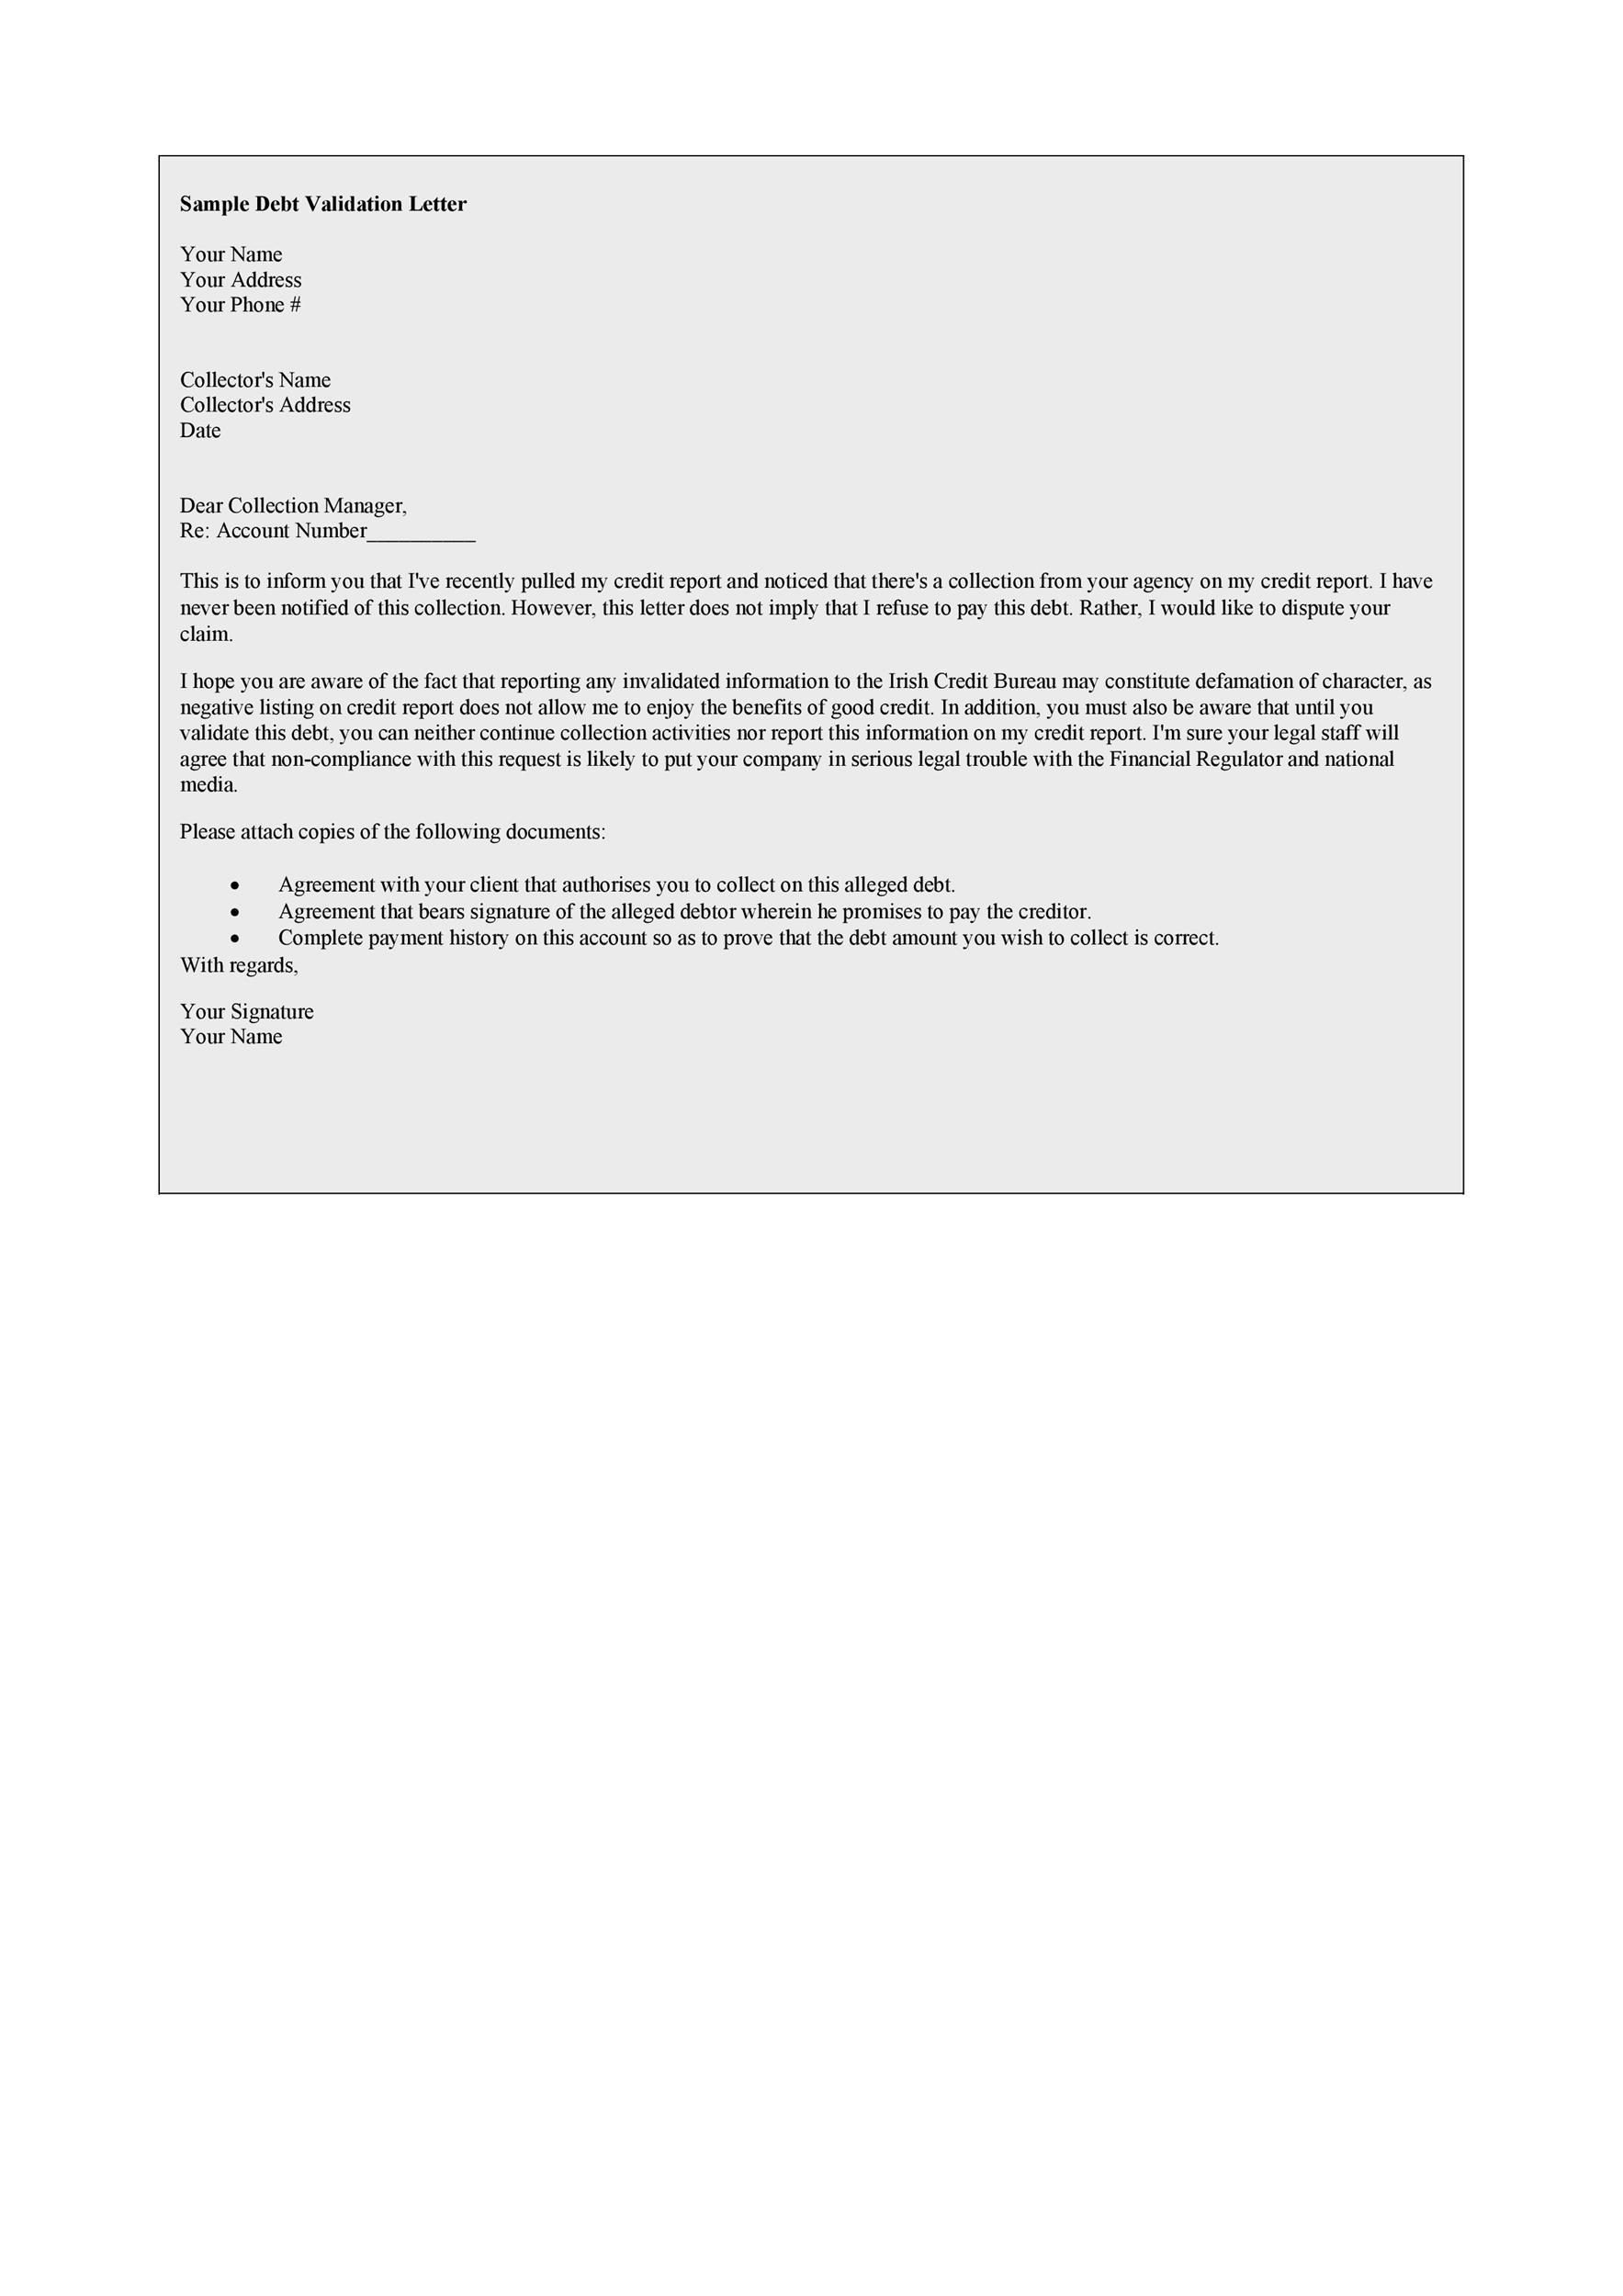 Free debt validation letter 16